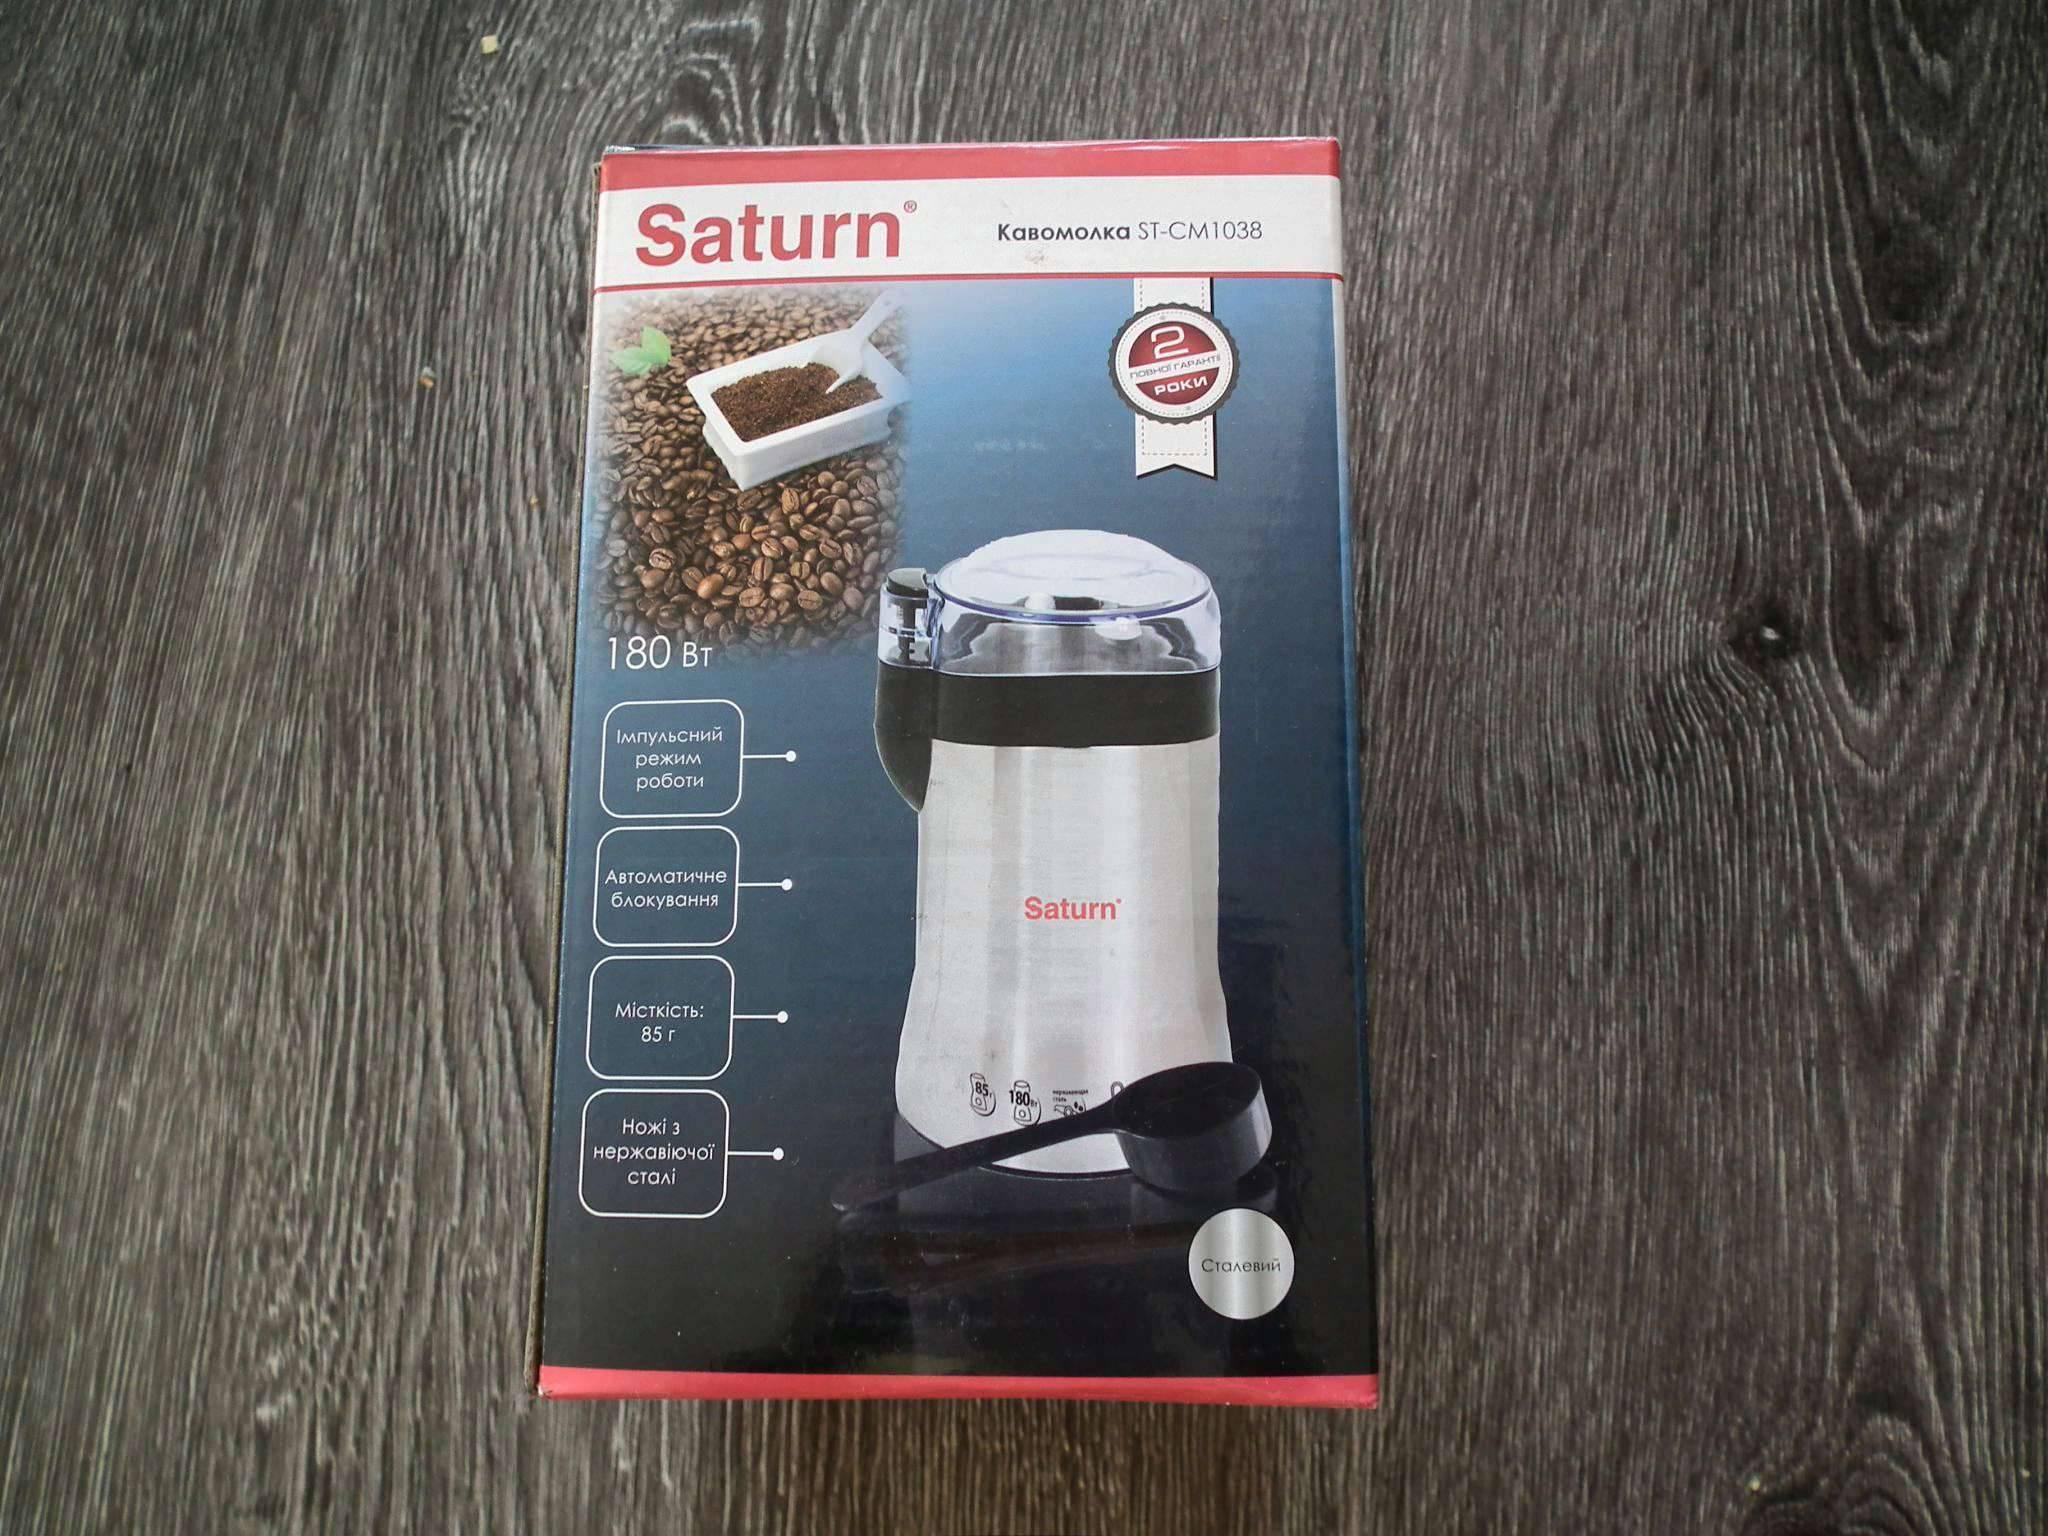 Кофемолка saturn st-cm1038 leo